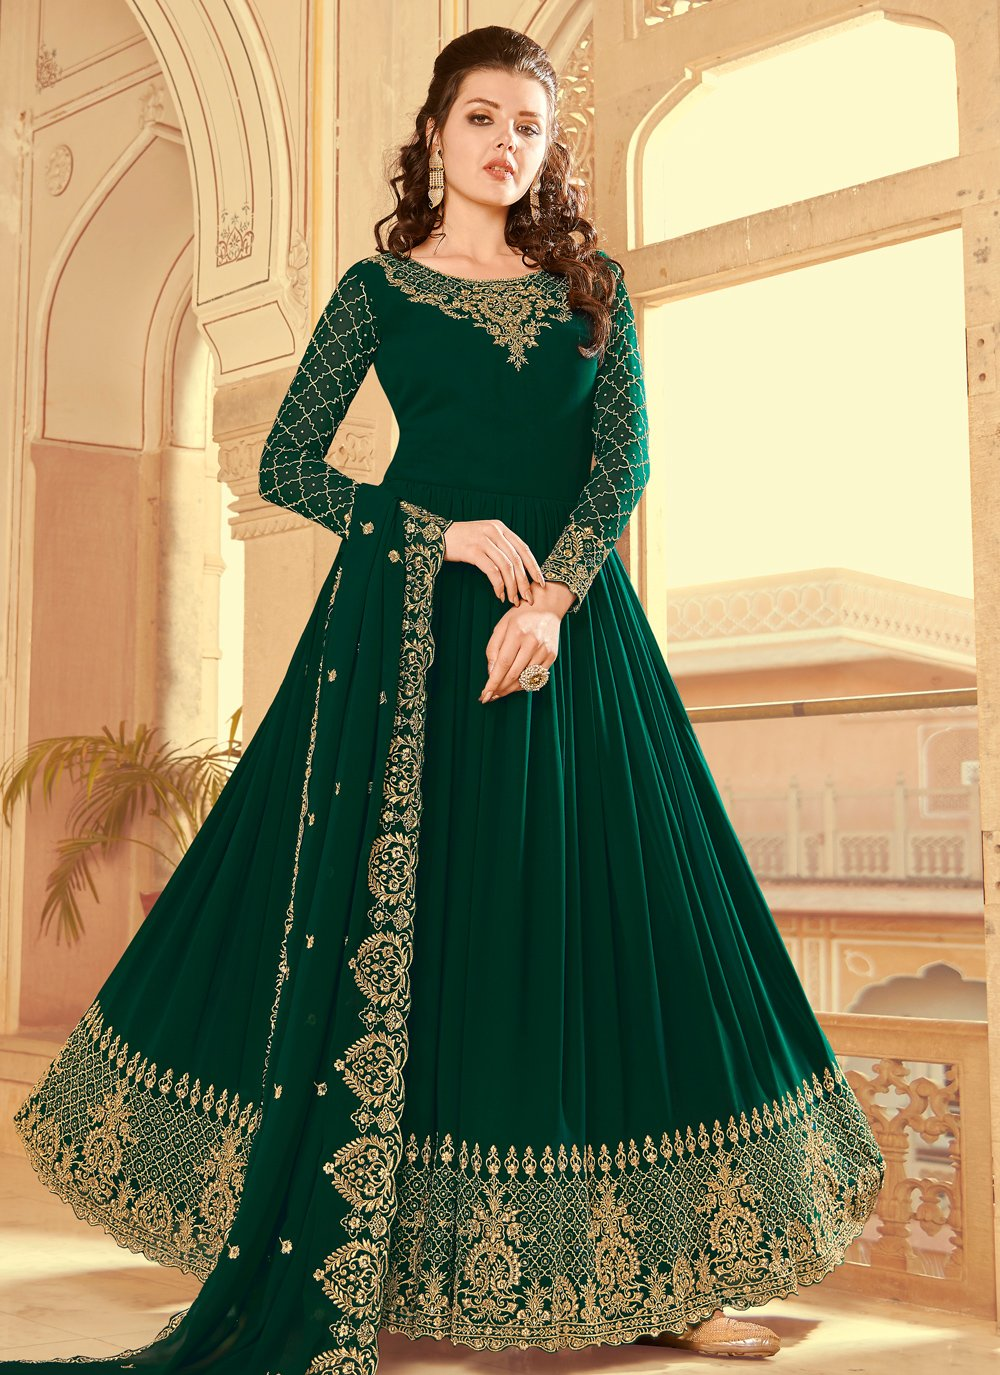 Green Faux Georgette Resham Floor Length Anarkali Suit